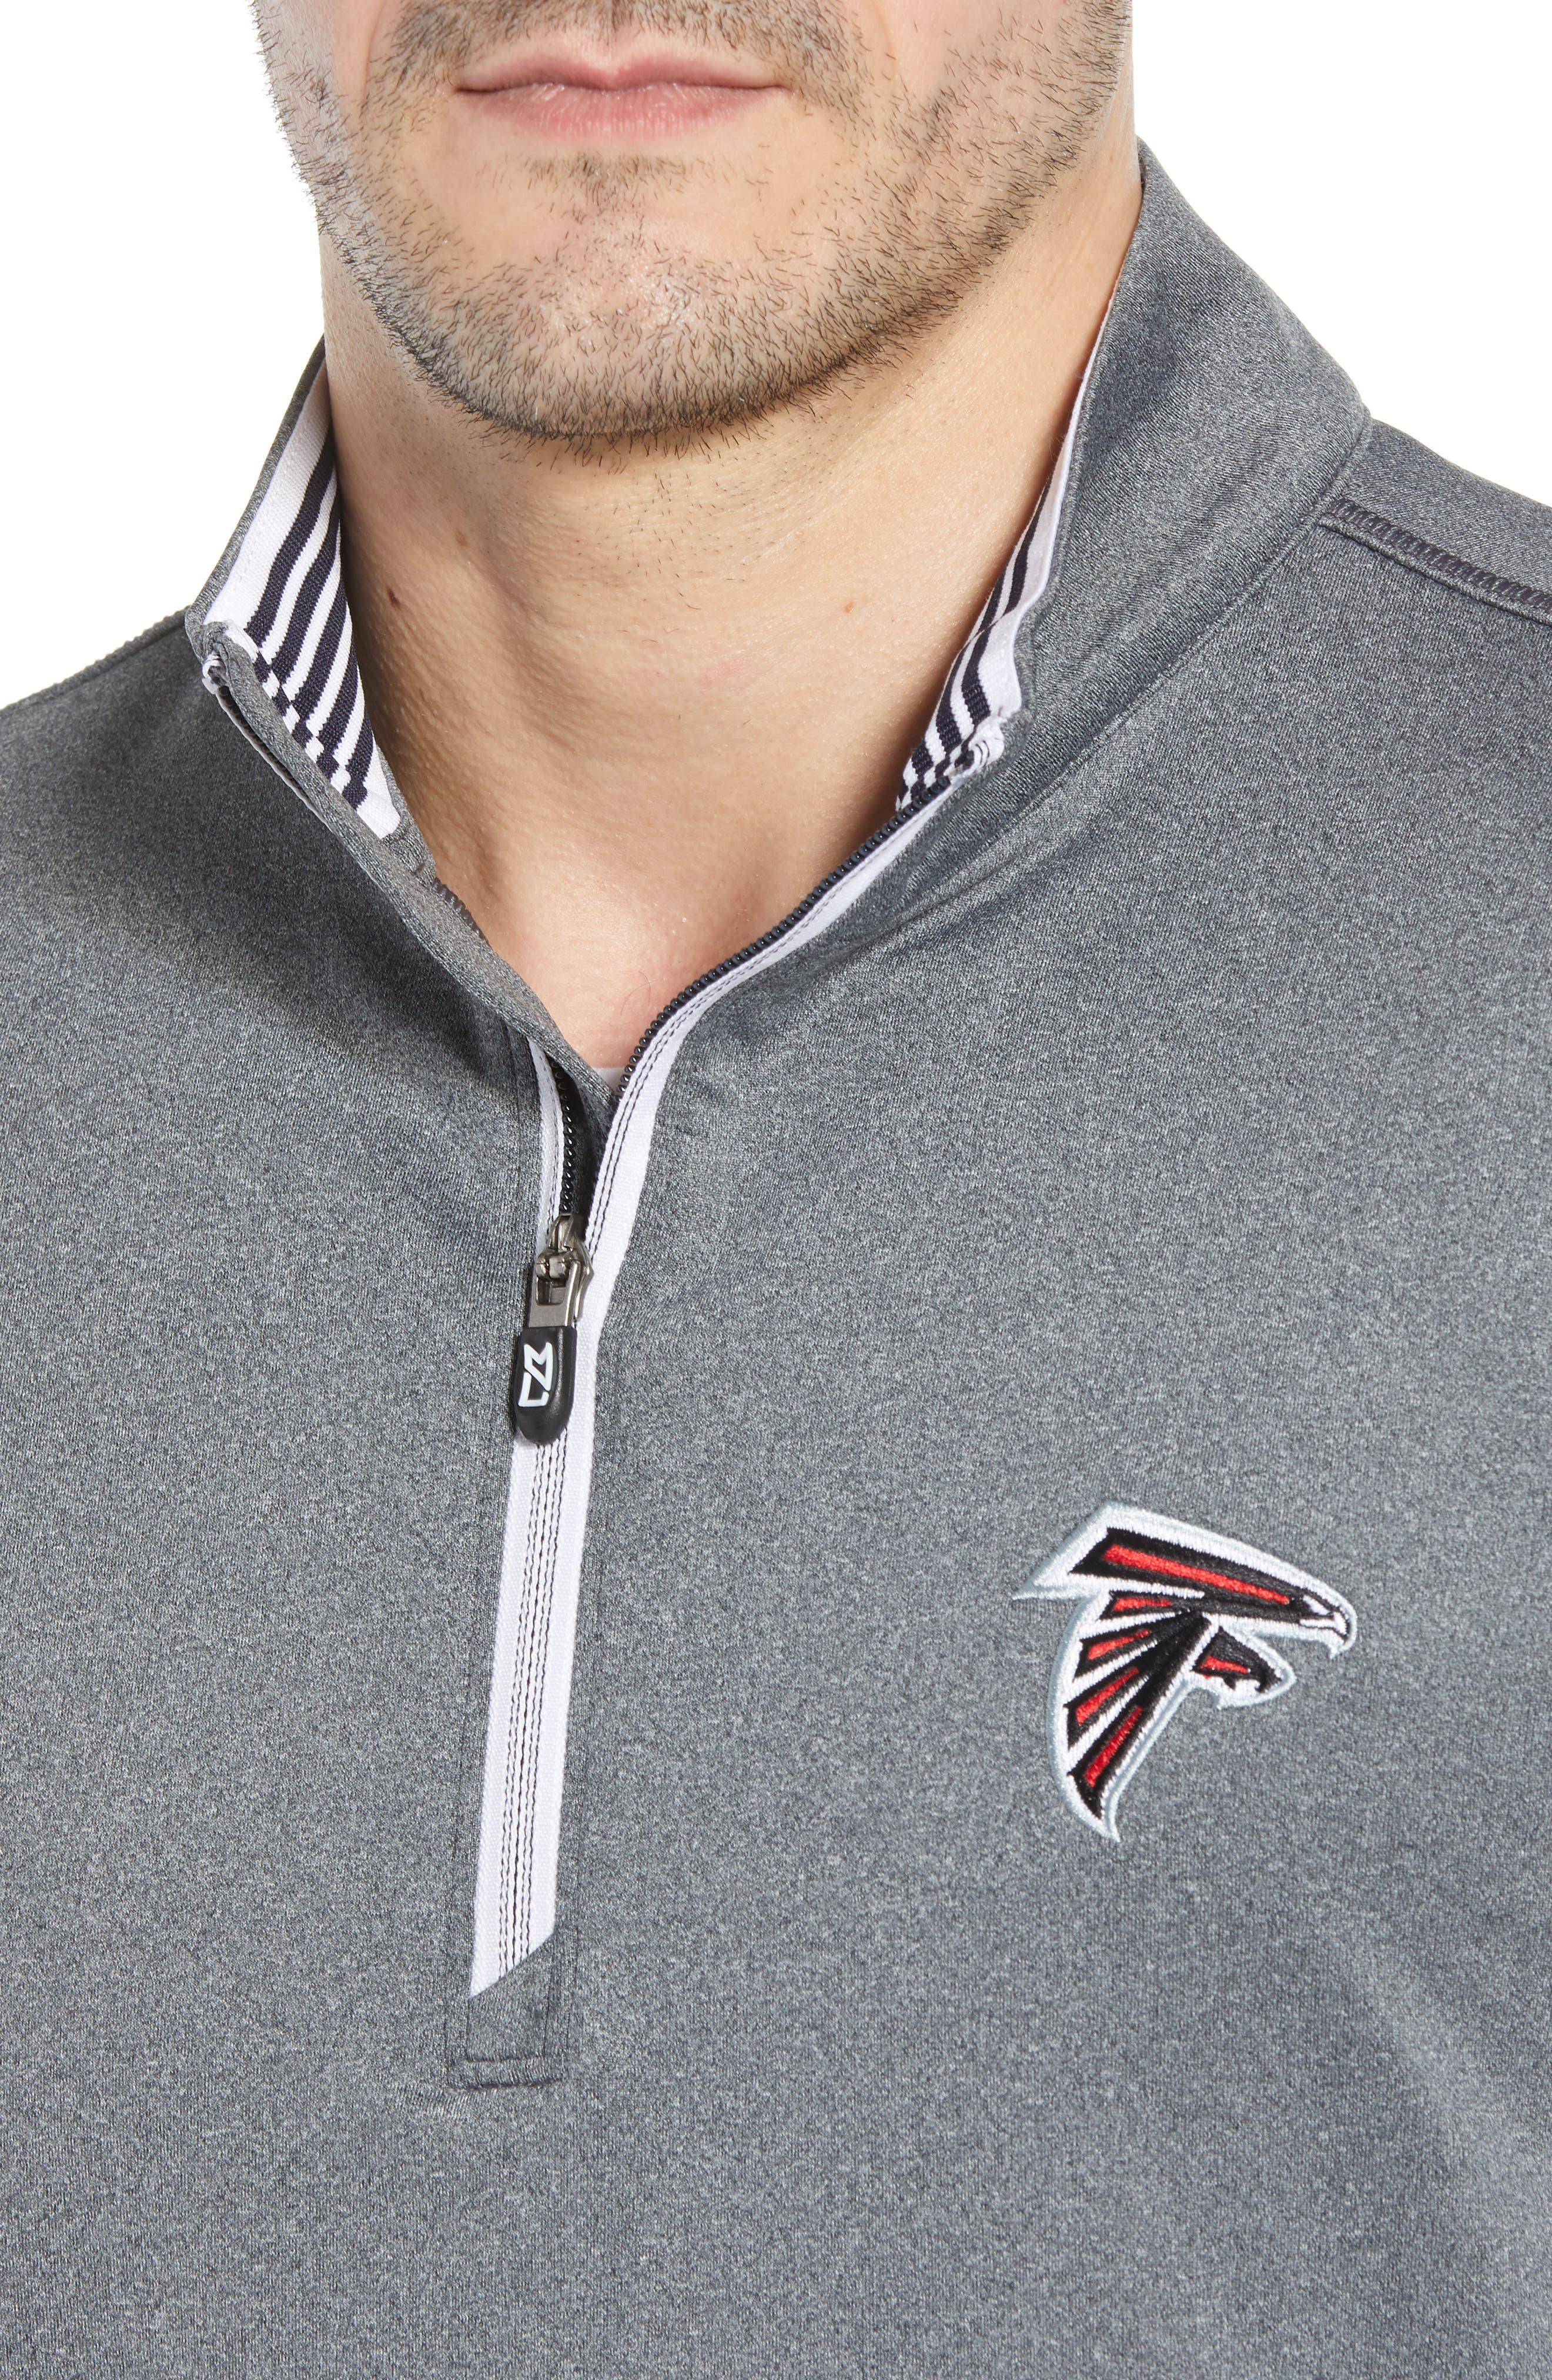 Endurance Atlanta Falcons Regular Fit Pullover,                             Alternate thumbnail 4, color,                             CHARCOAL HEATHER